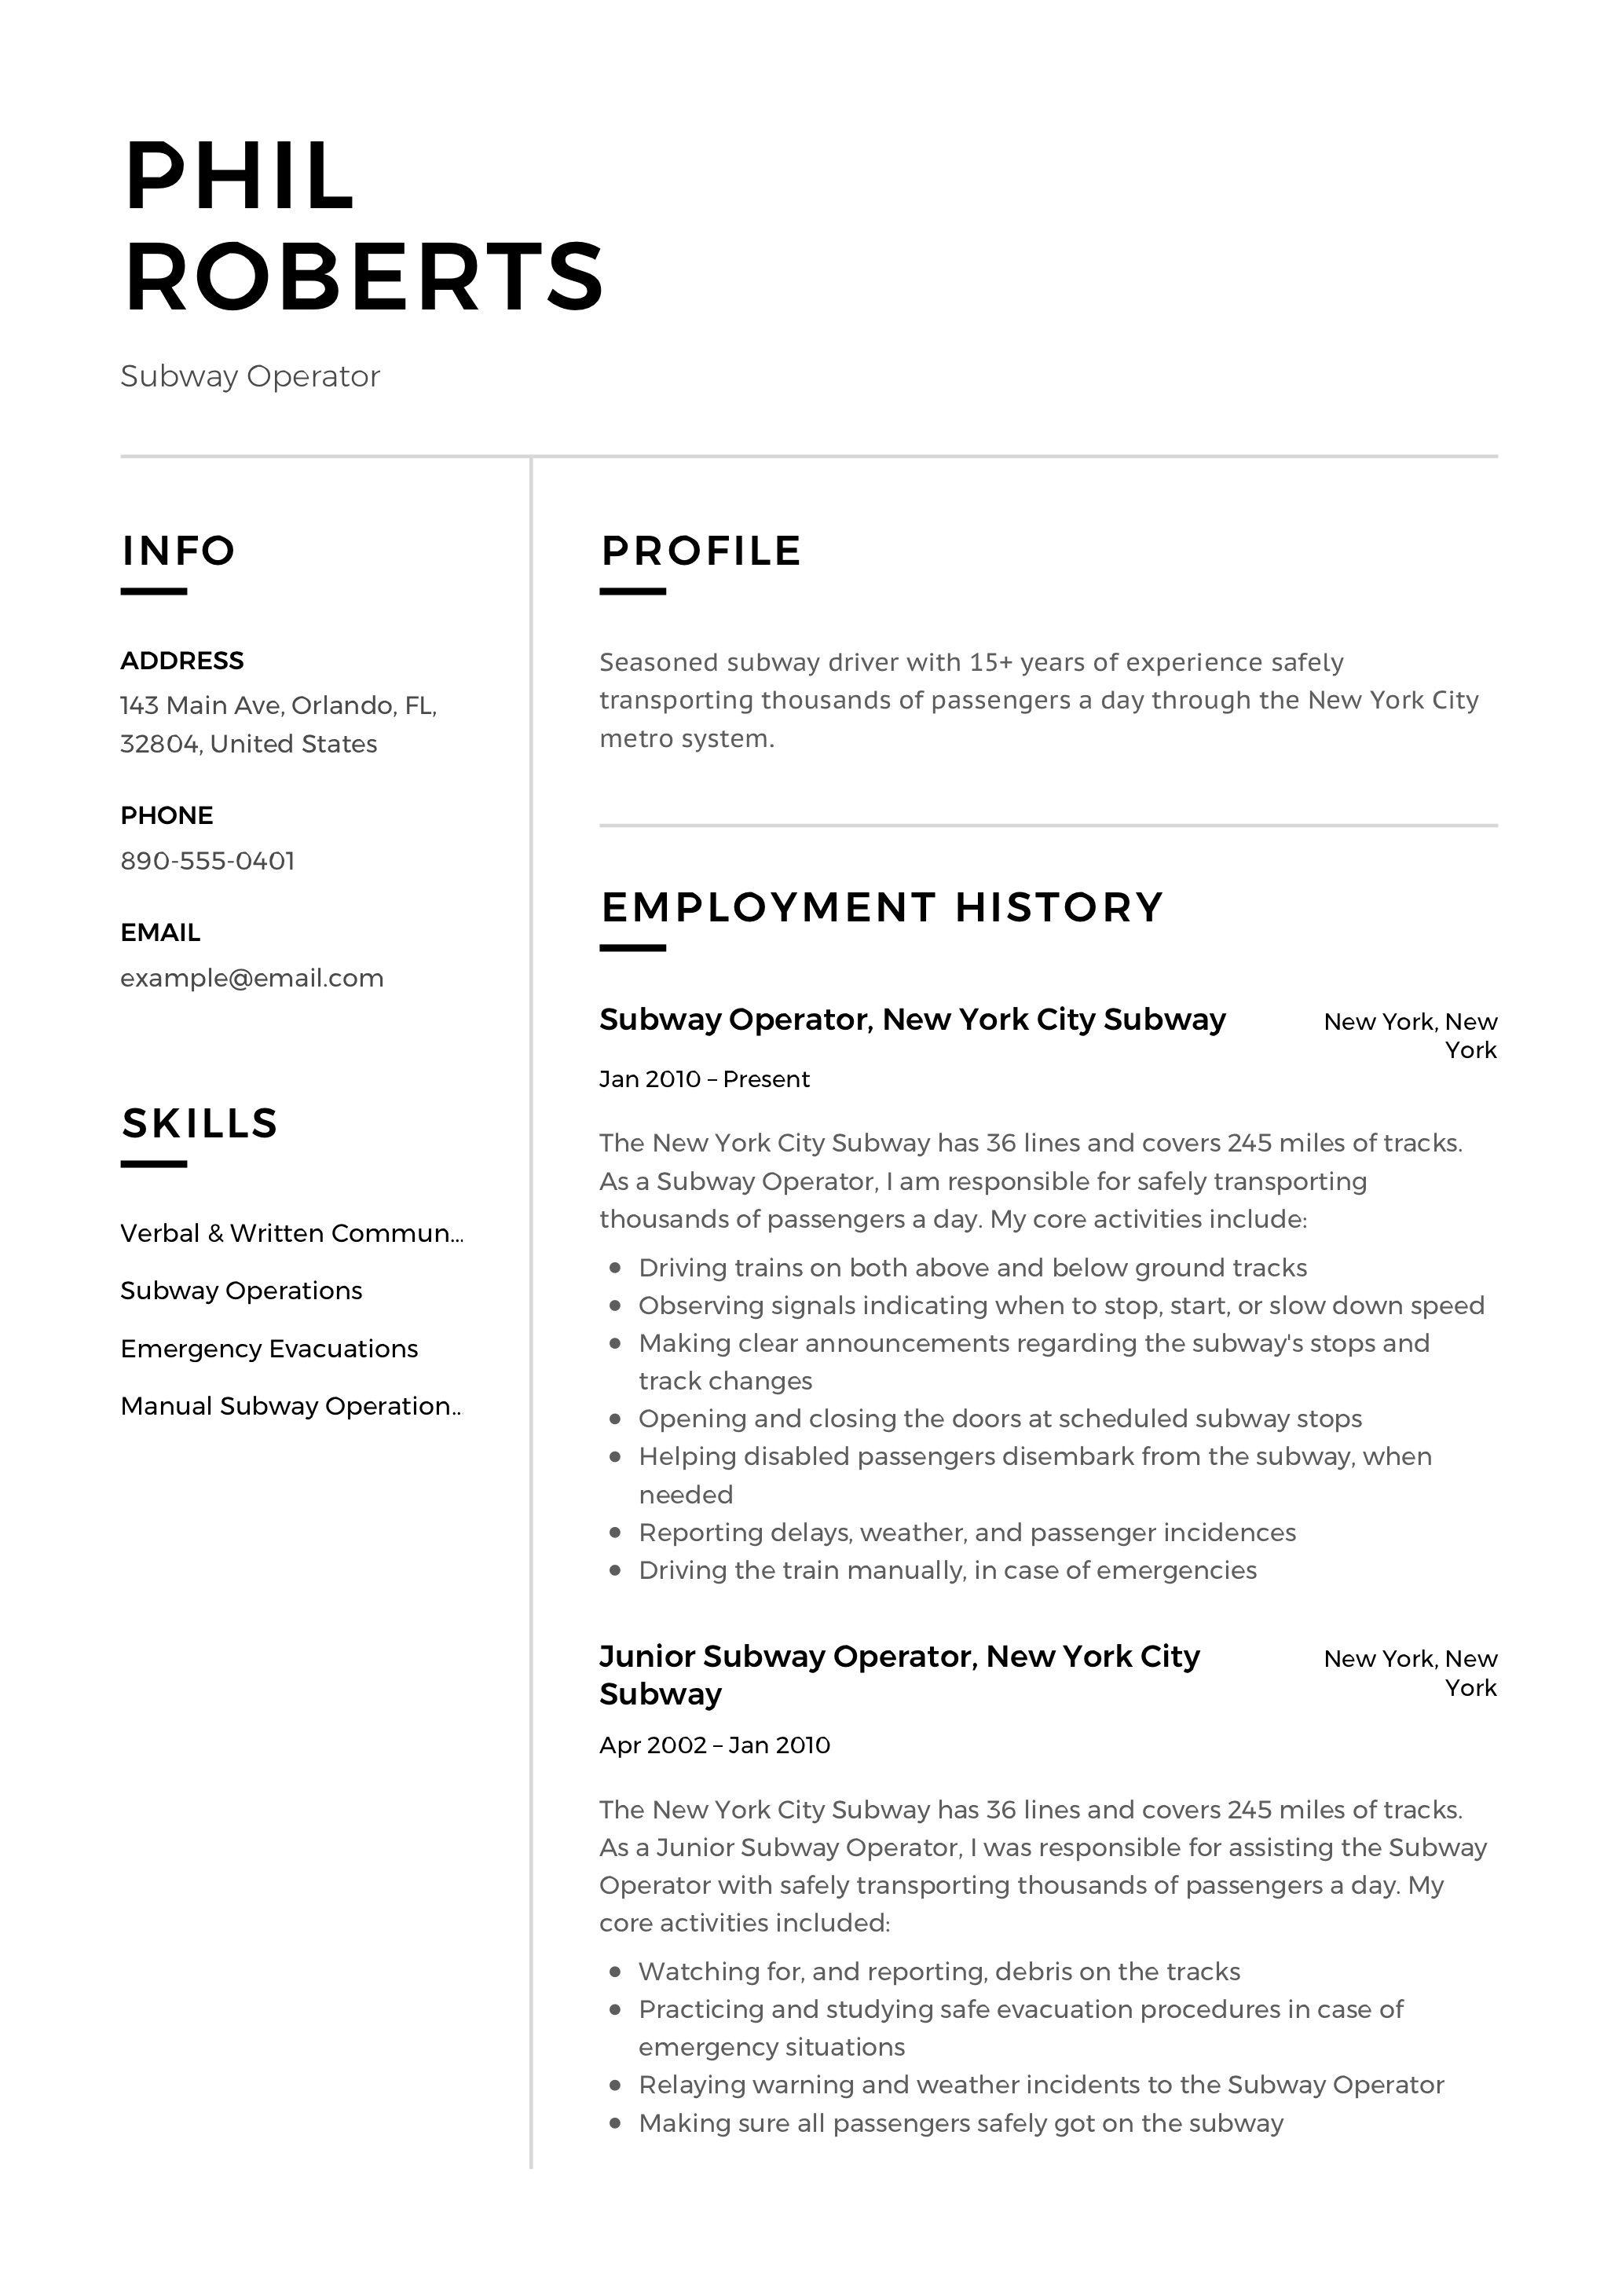 Subway Operator Resume Template Resume Examples Professional Resume Examples Basic Resume